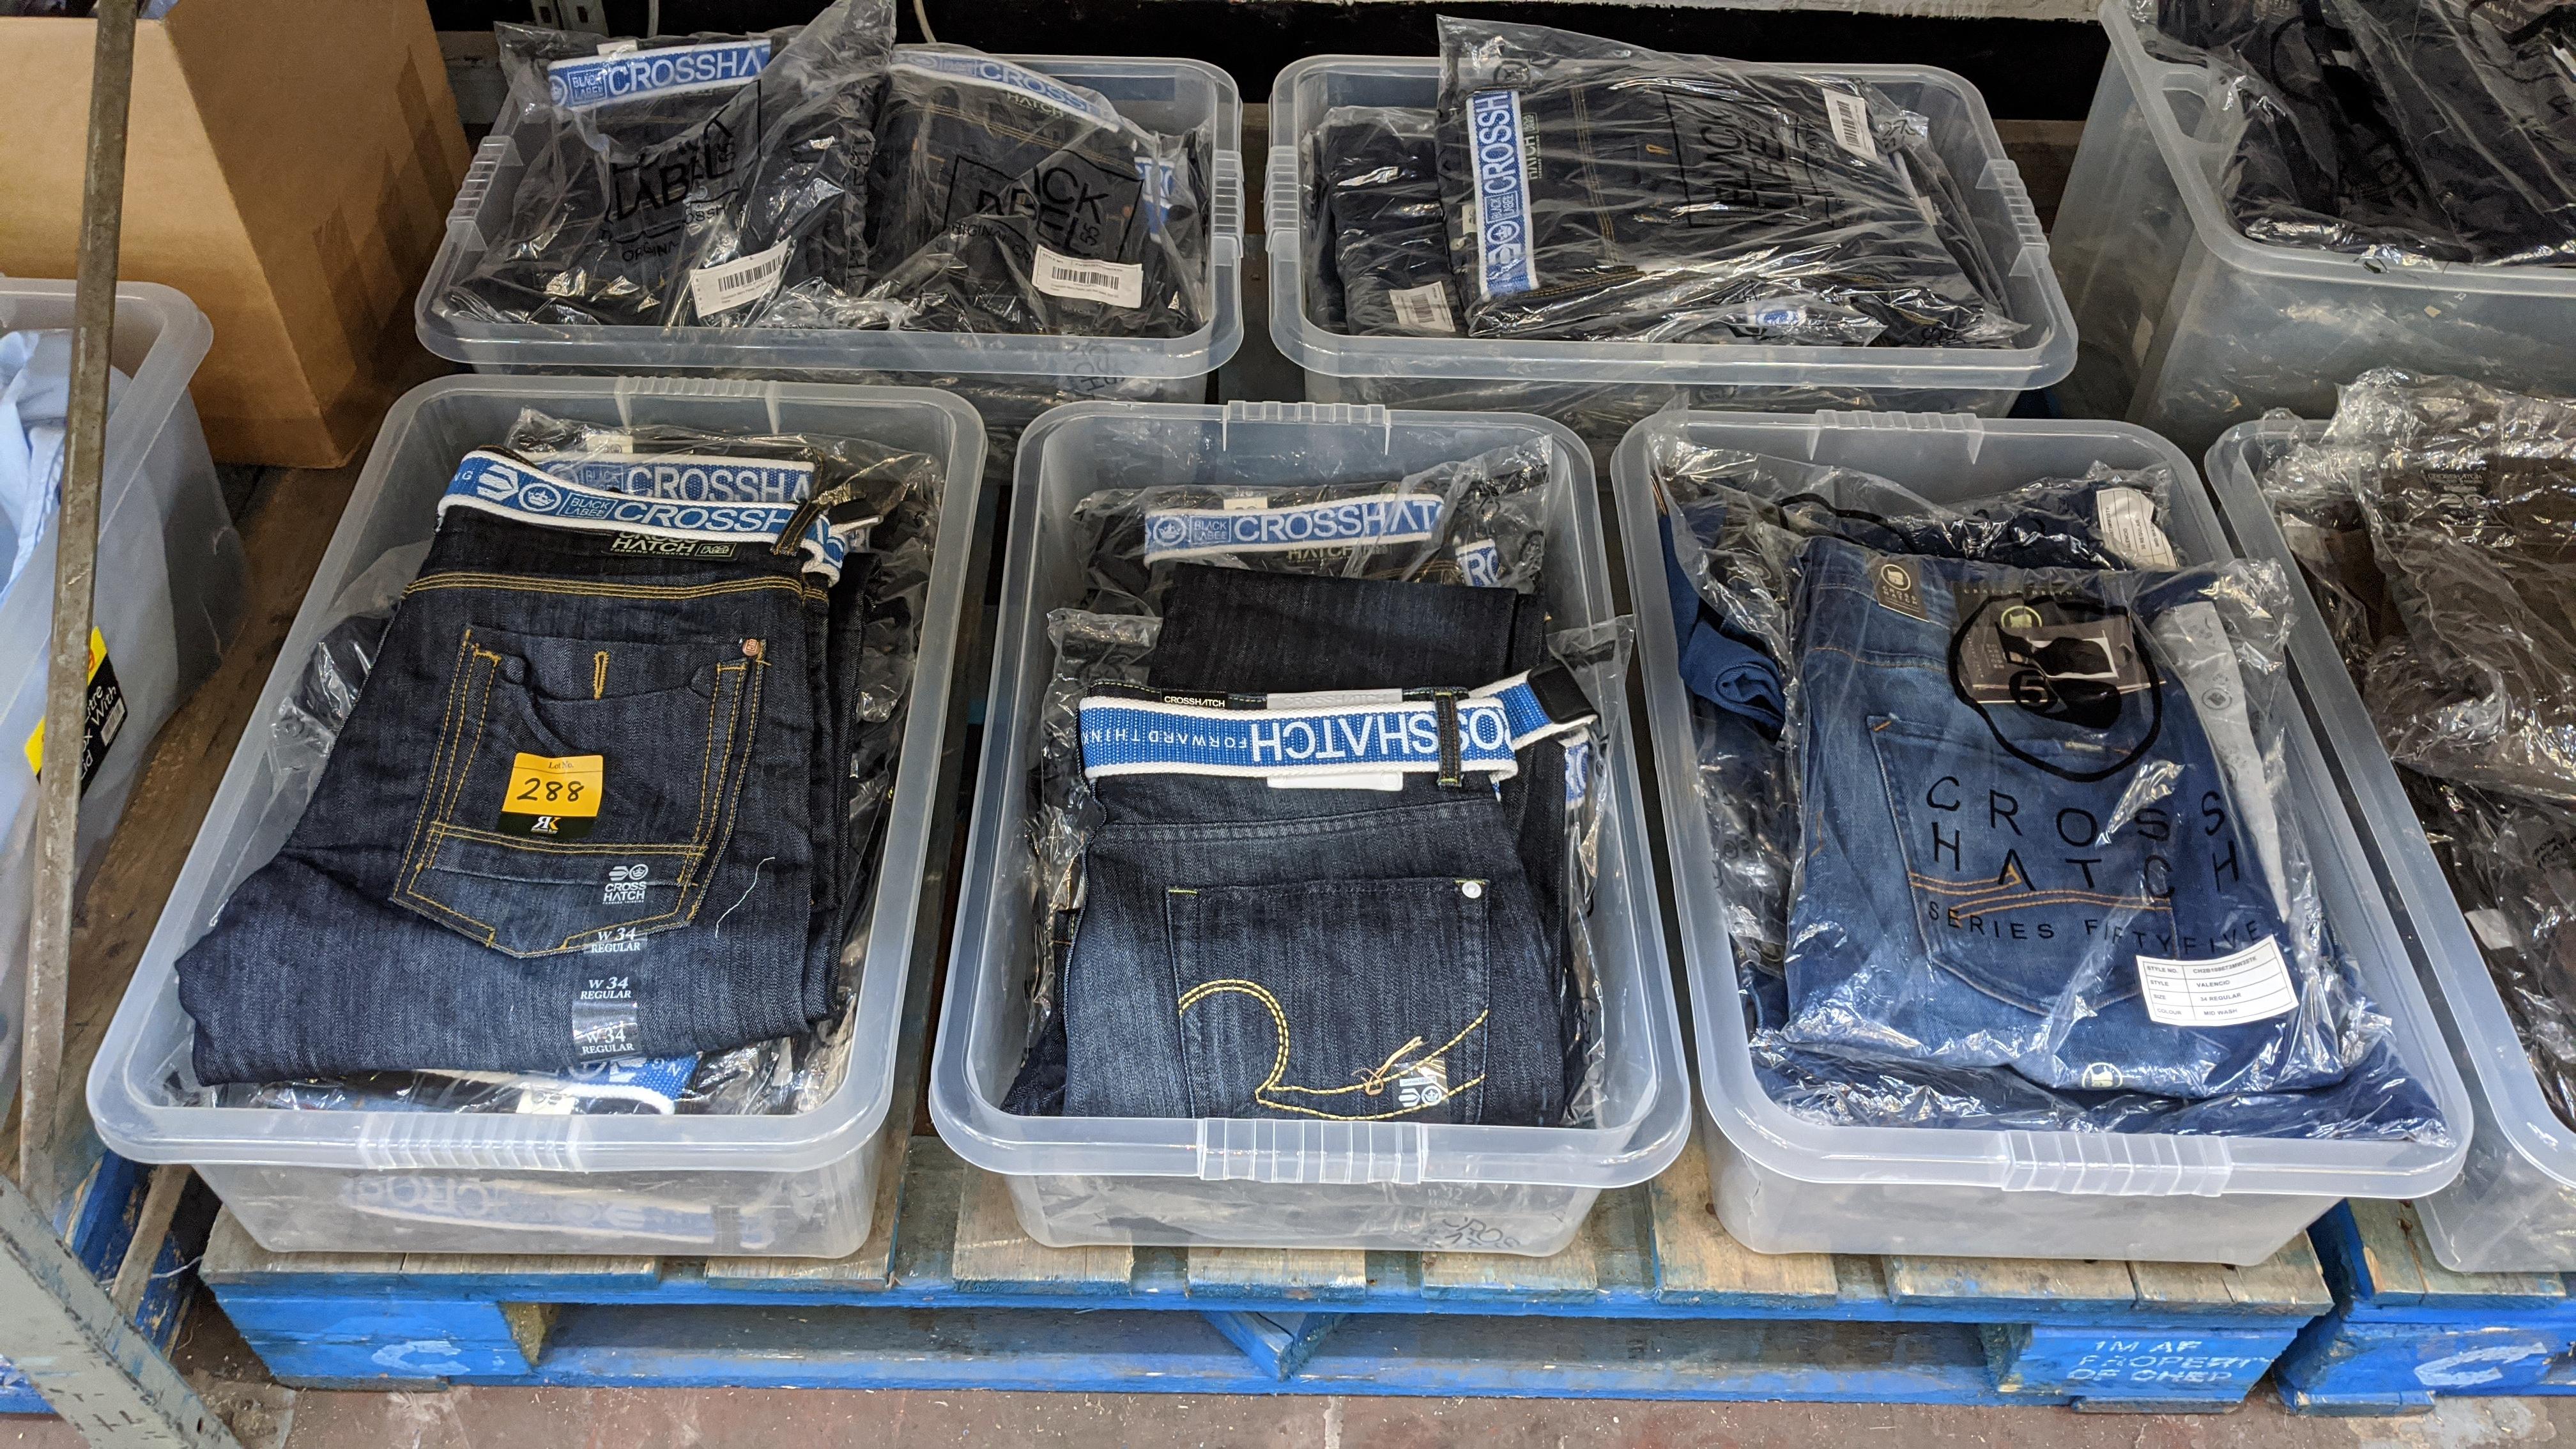 Very large quantity of primarily men's designer clothing & accessories. - Image 51 of 157